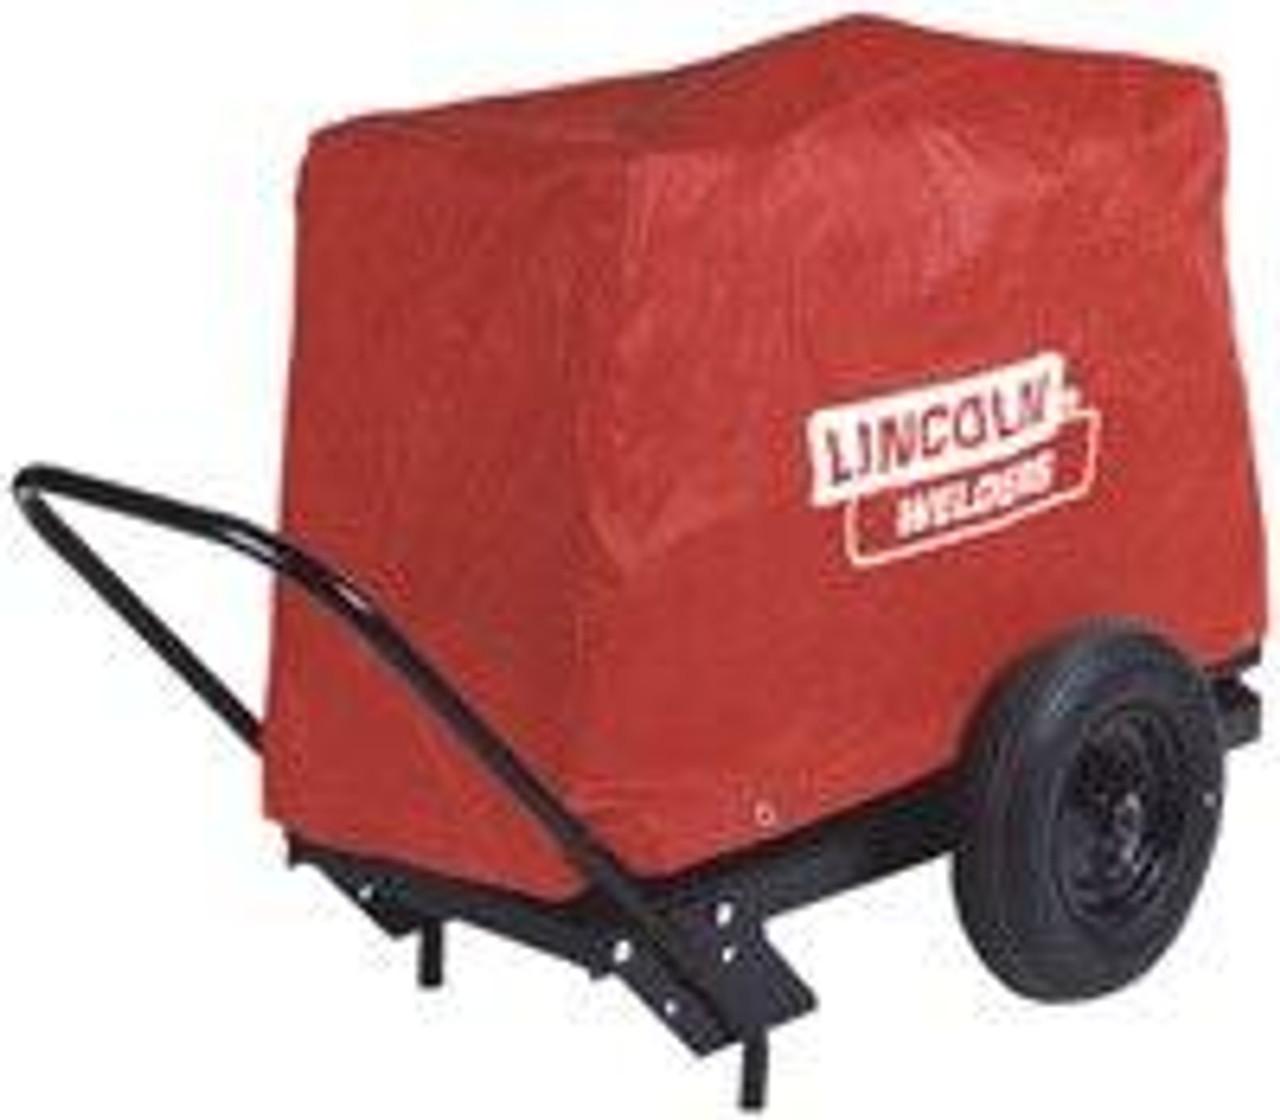 Lincoln Ranger Canvas Cover K886-1